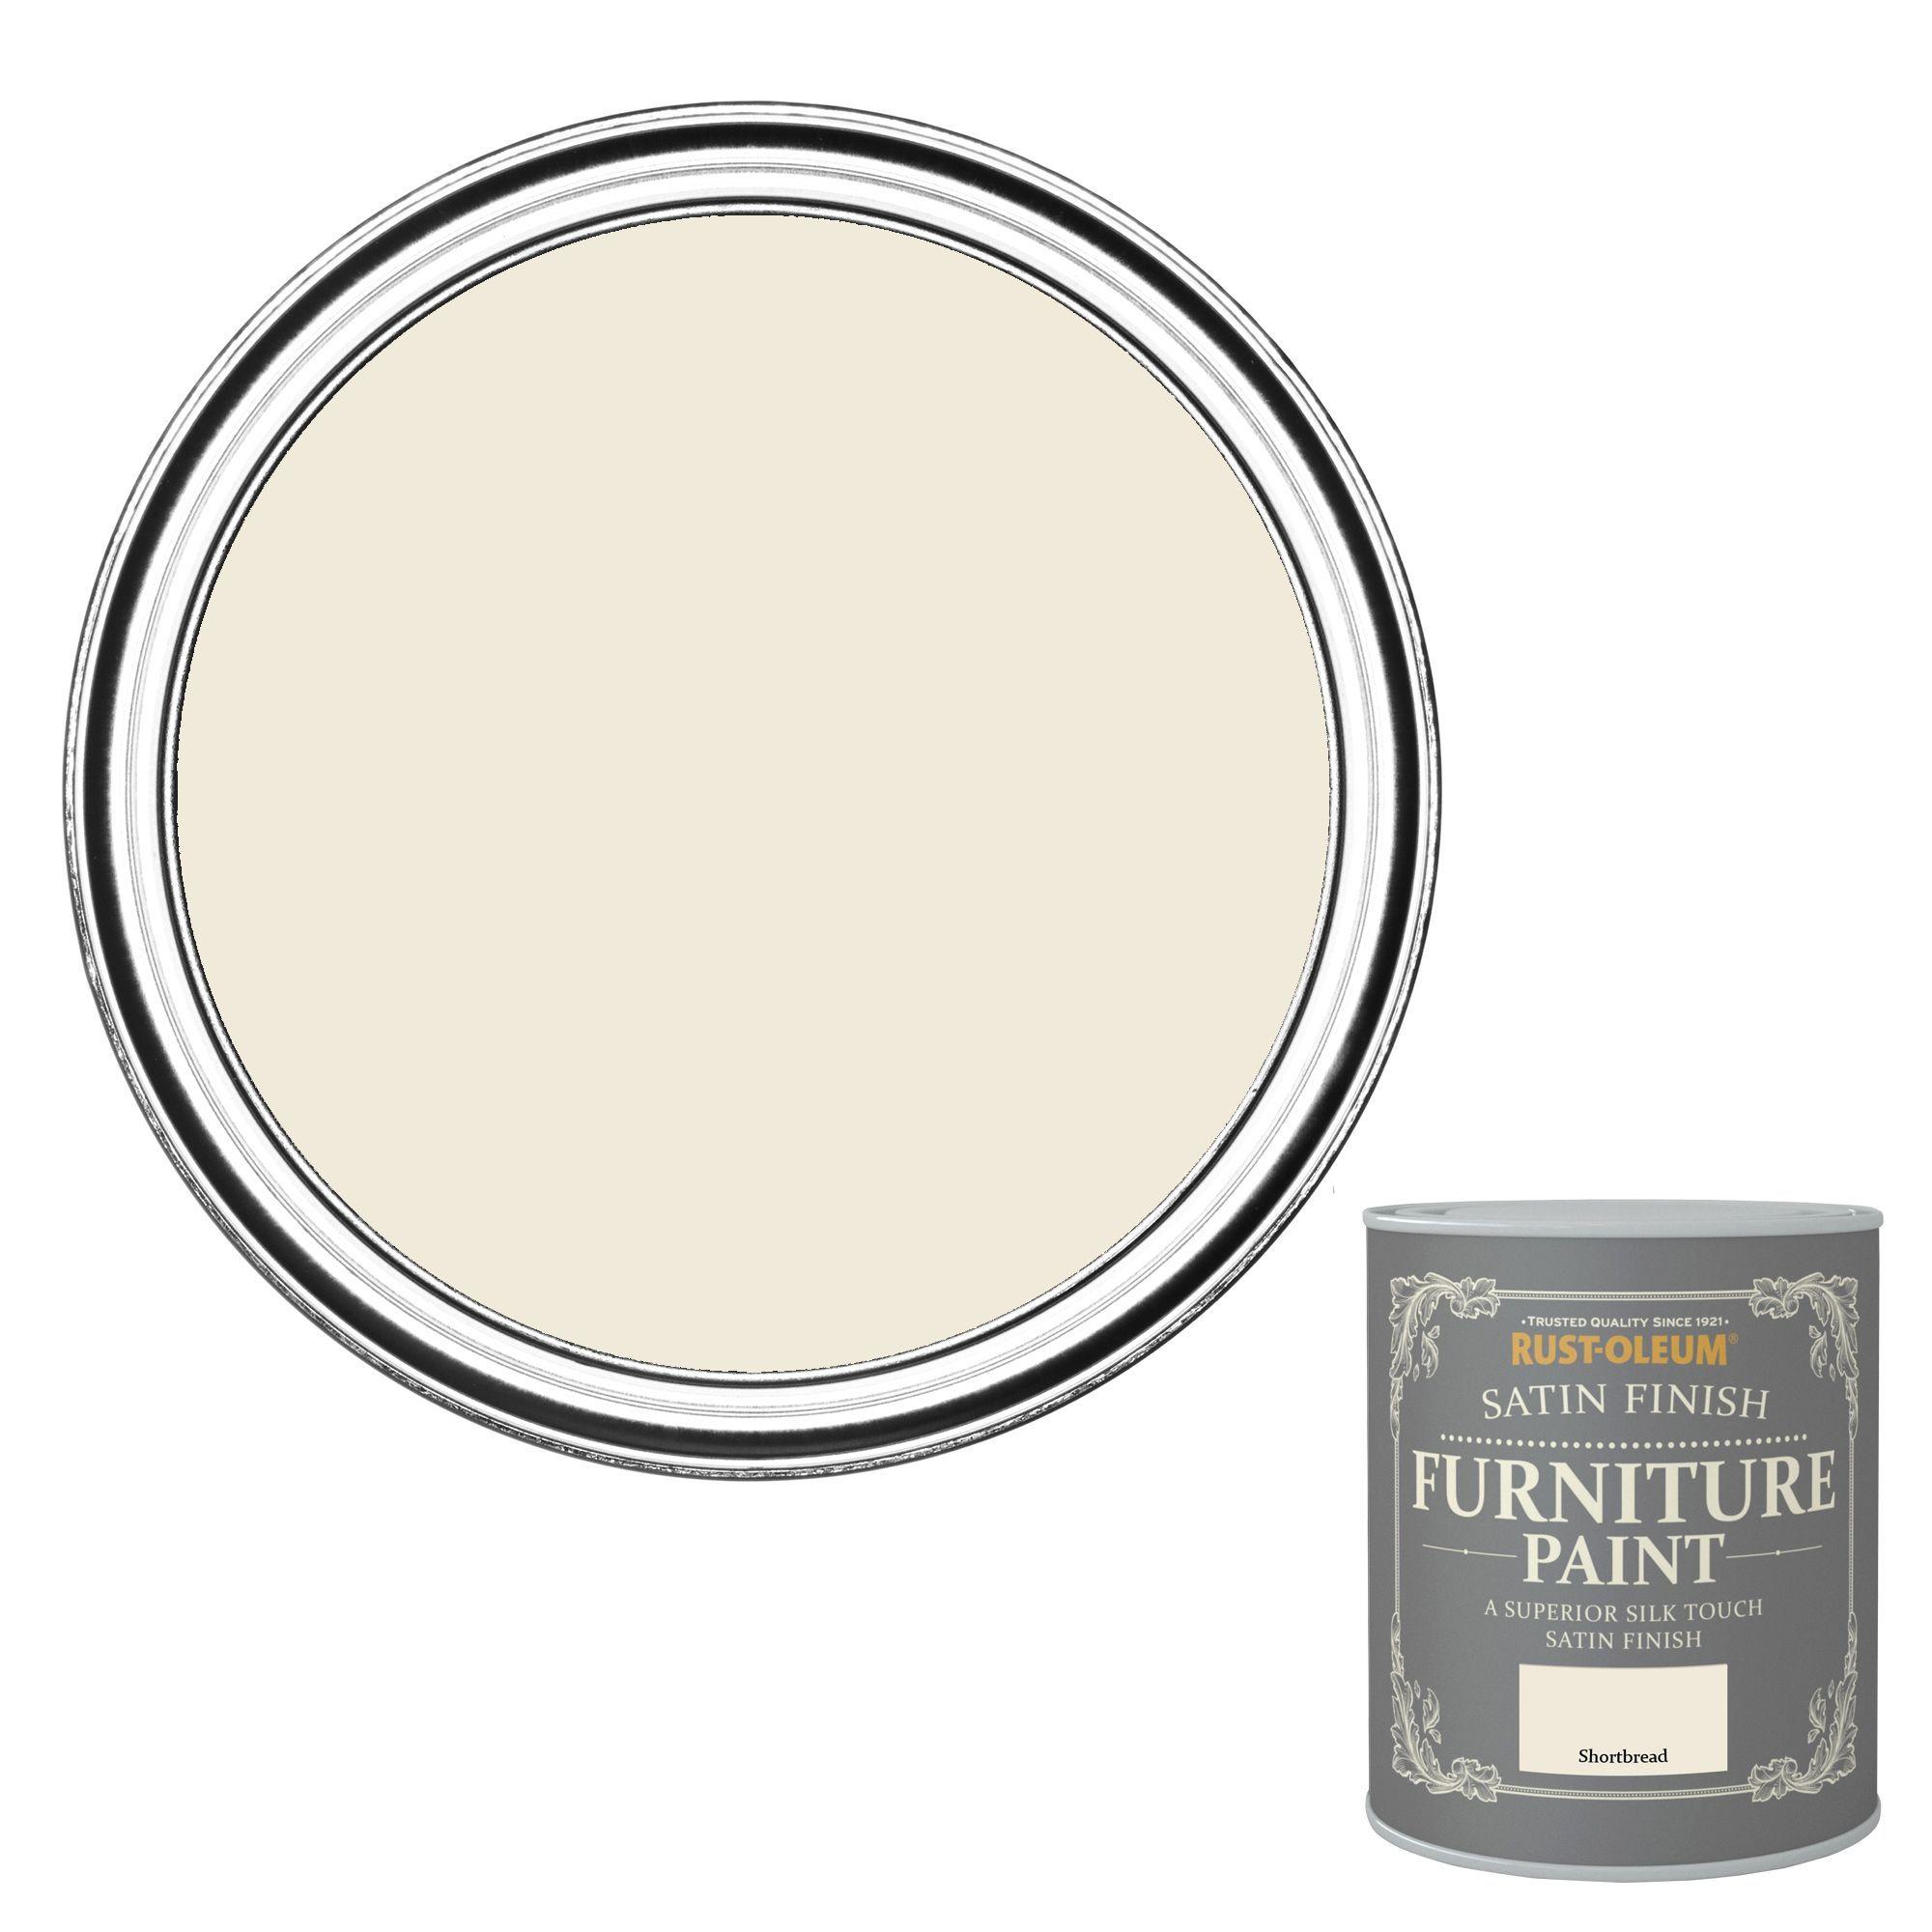 Rust Oleum Chalky Anthracite Floor Paint 2 5l Departments Diy At B Q Painted Floors Rustoleum Painted Furniture